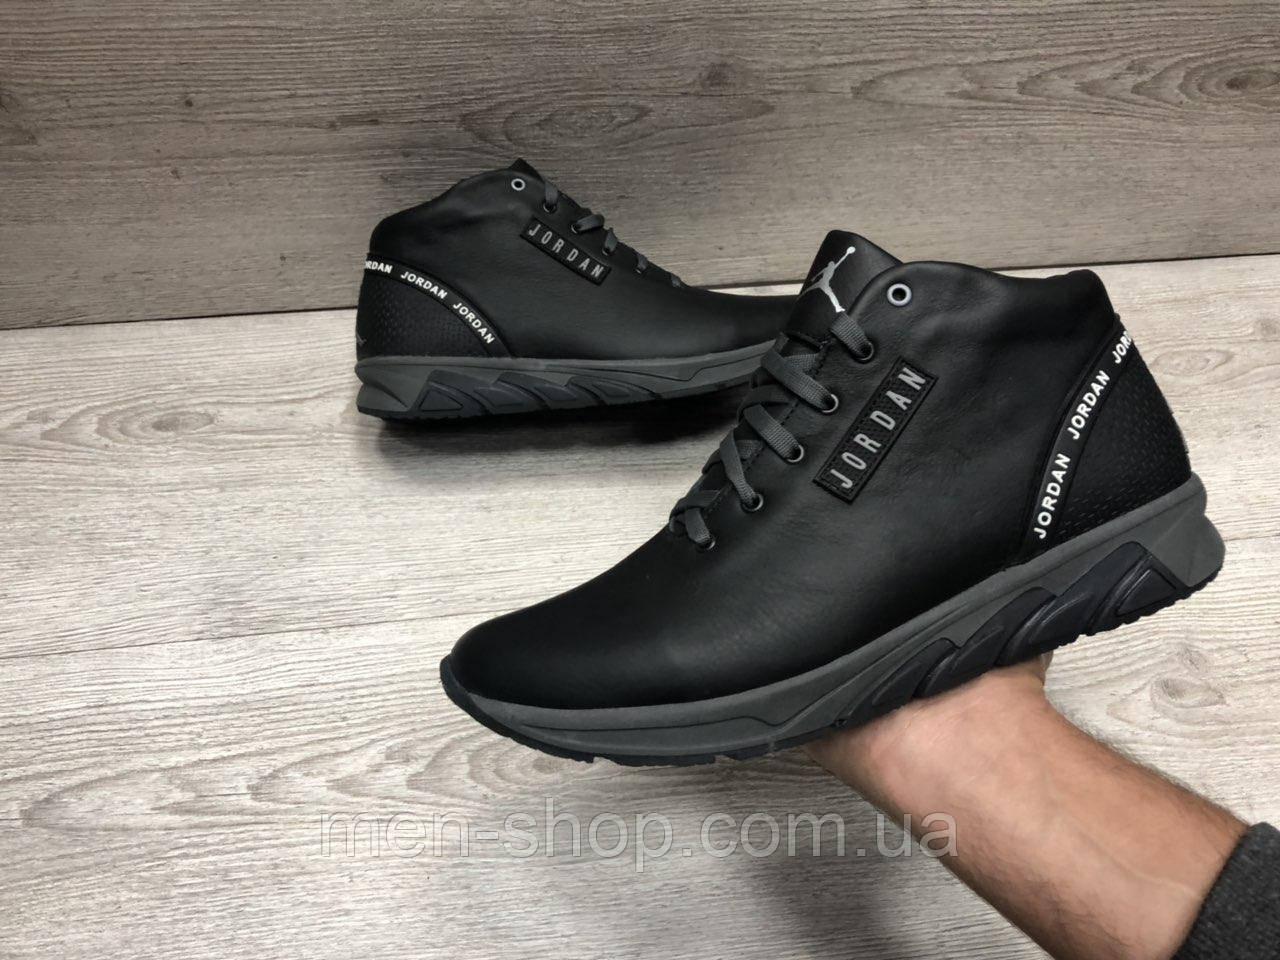 e8aeaa64 Теплые Зимние мужские кроссовки в стиле Jordan: продажа, цена в ...